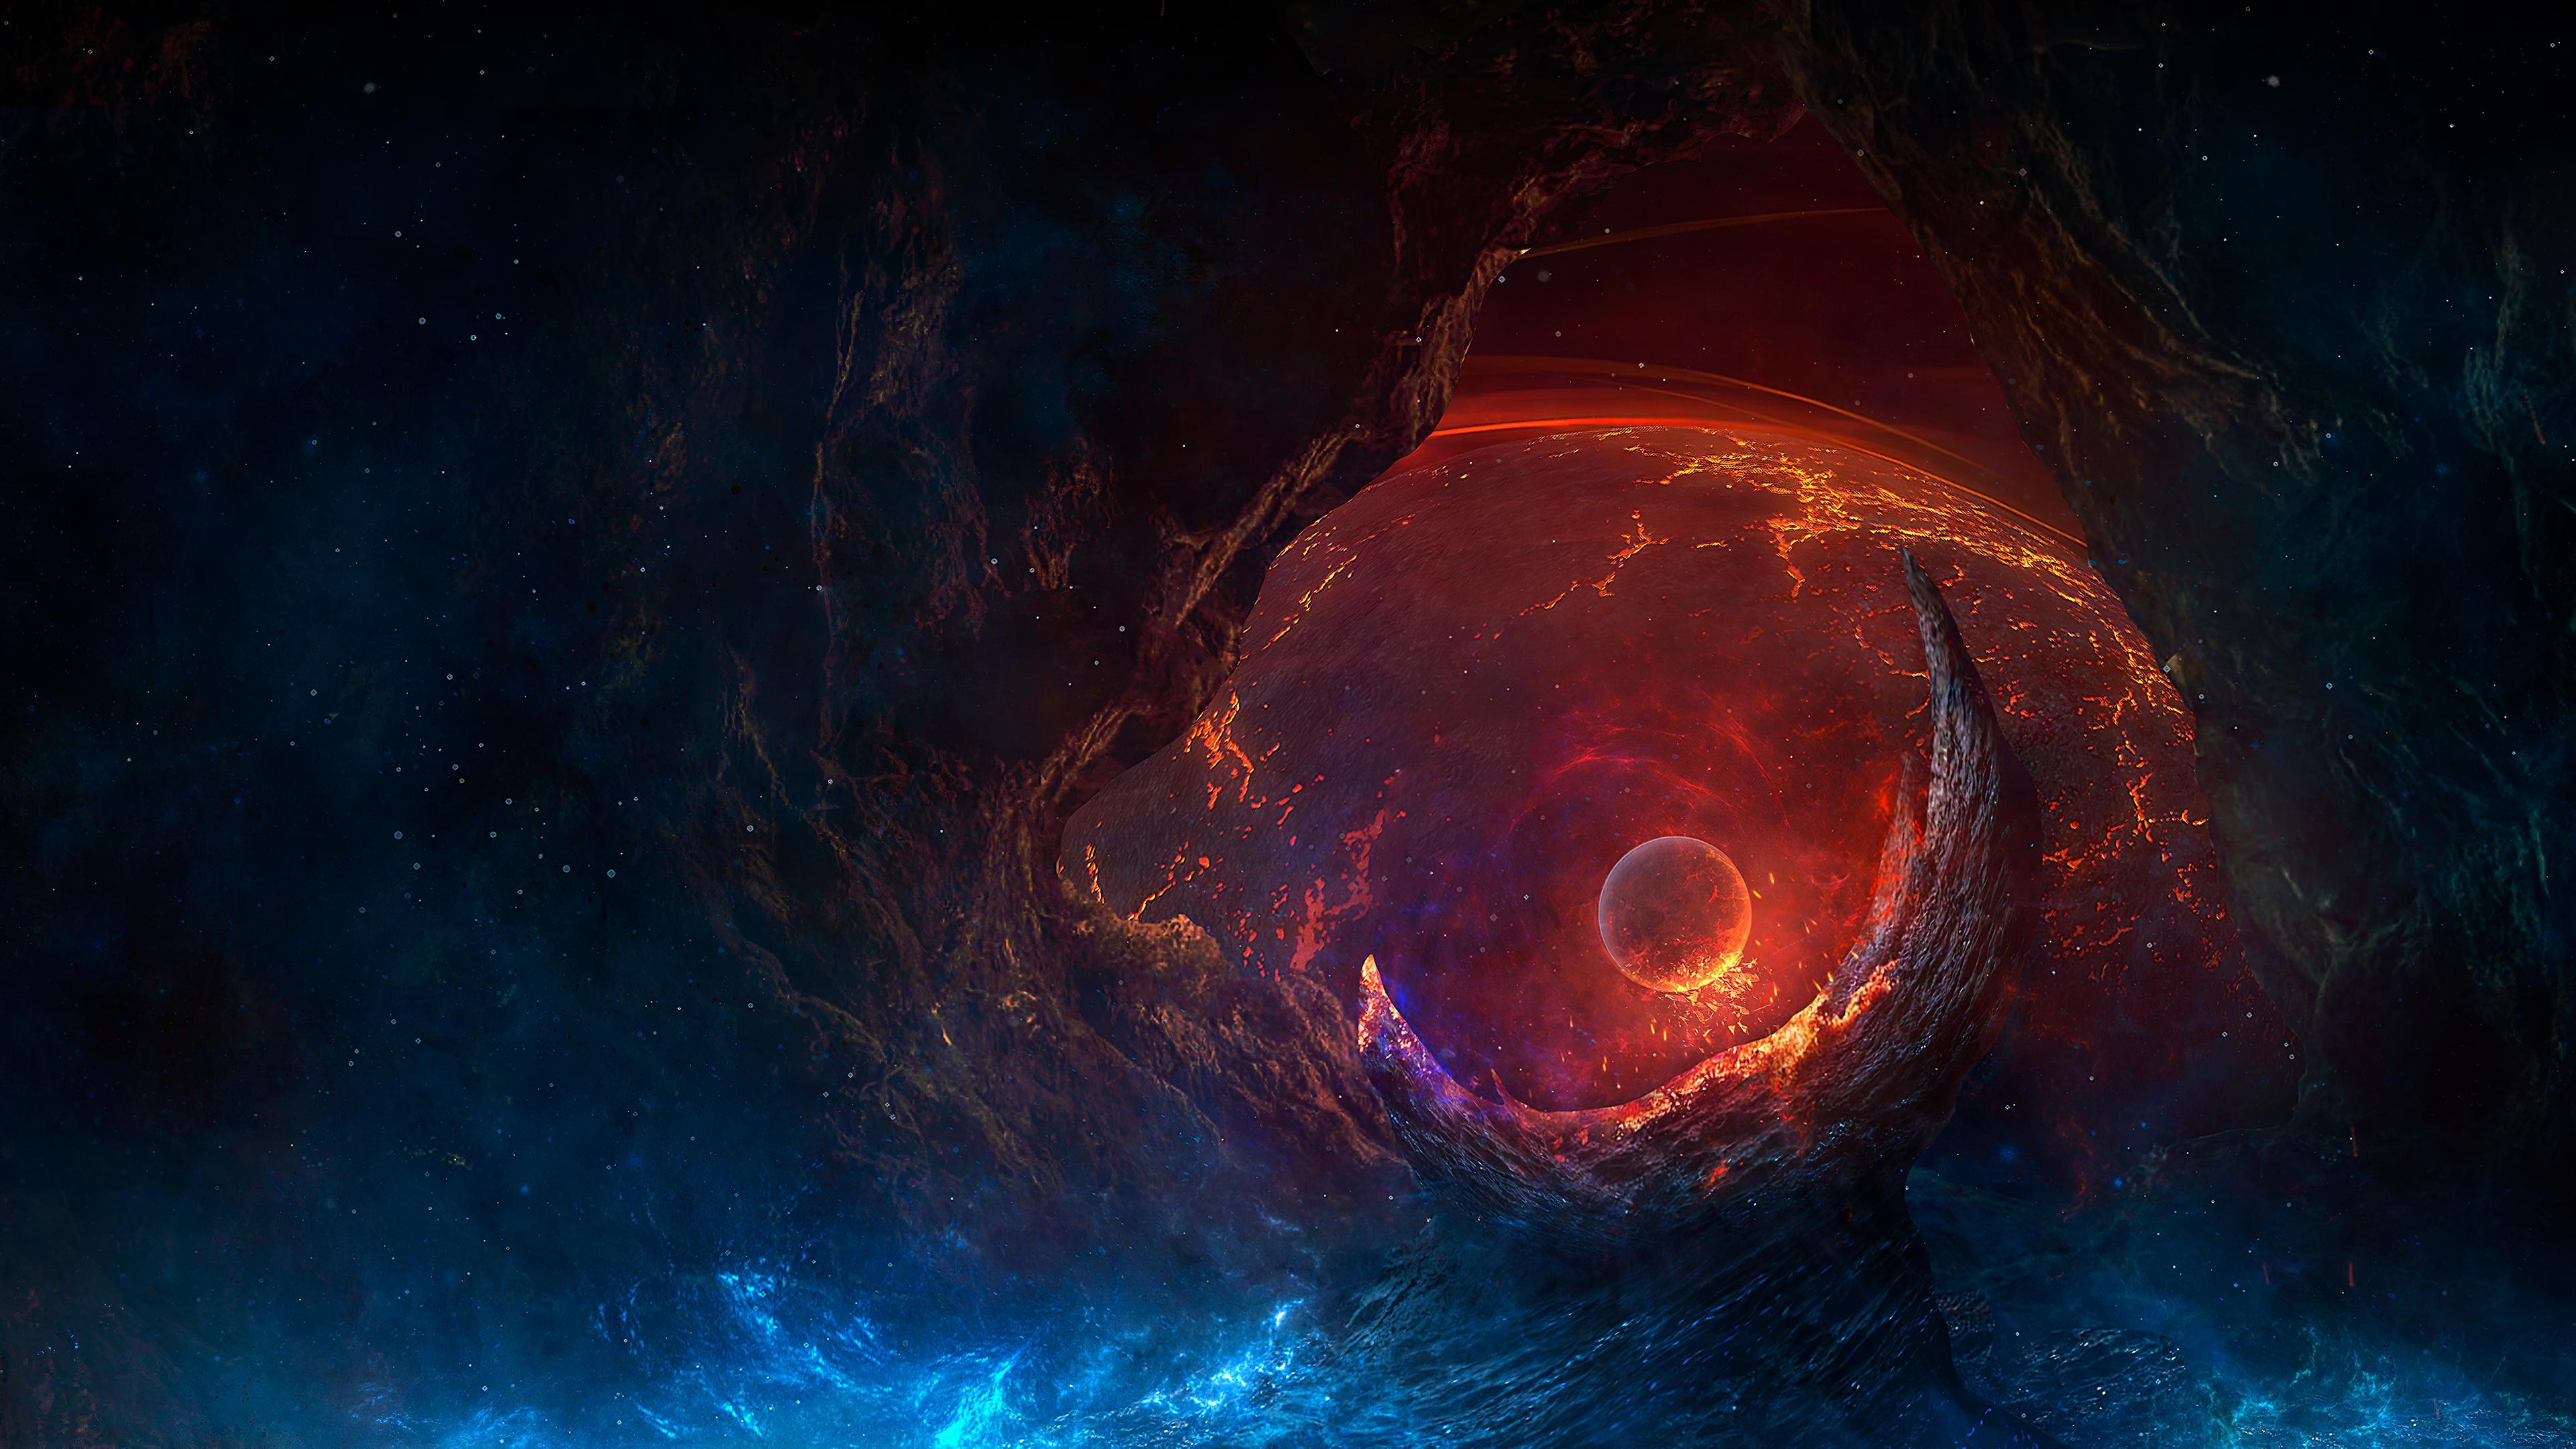 Wallpaper Digital Art Artwork Illustration Fantasy Art Planet Ruin Destruction Galaxy Nebula Fire Spacescapes Space Art World End 3840x2160 Onis 1666233 Hd Wallpapers Wallhere